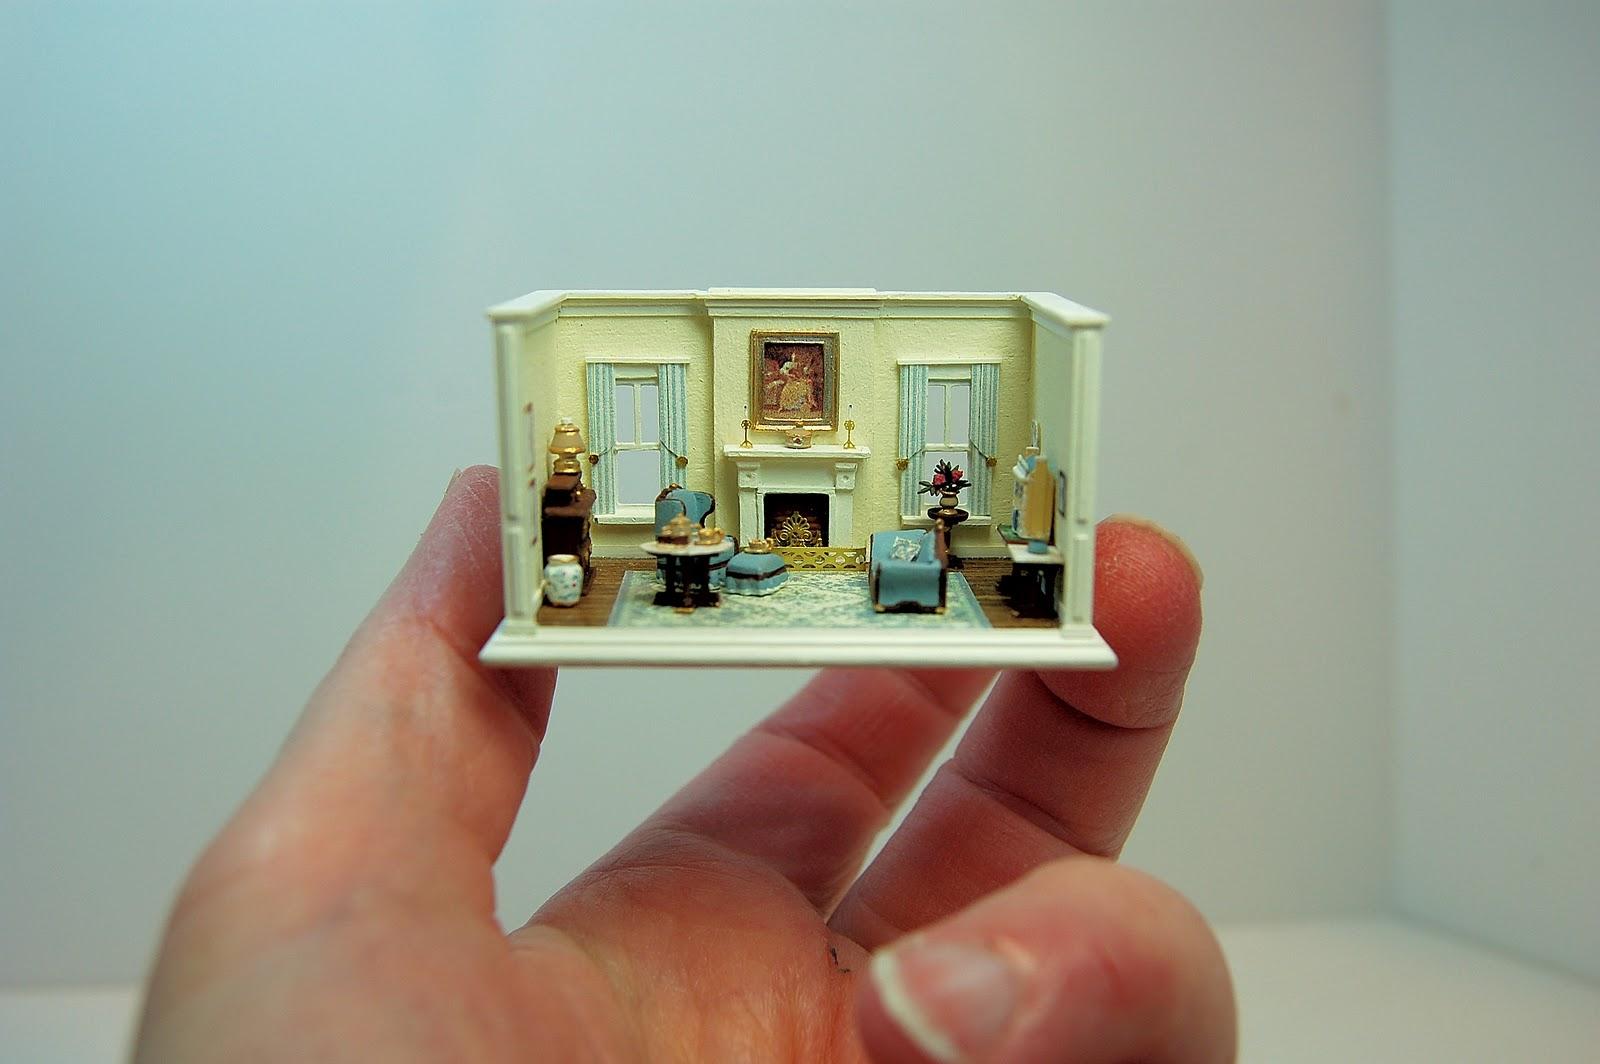 miniature miniatures nell corkin living room. Black Bedroom Furniture Sets. Home Design Ideas